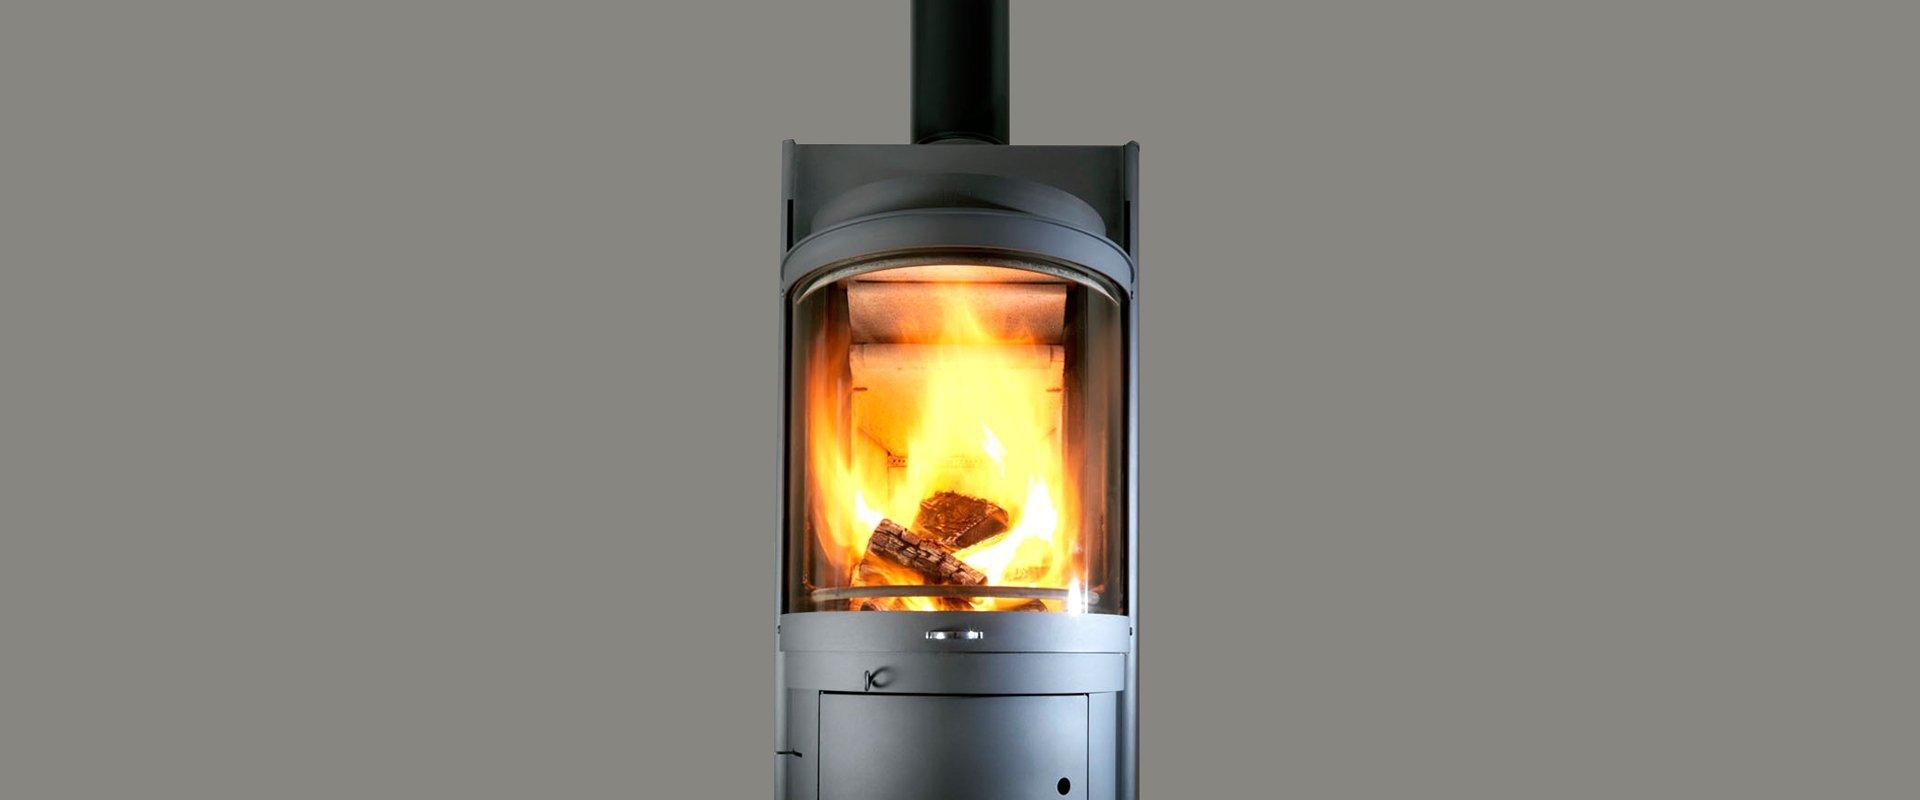 Haas & Sohn wood burning stoves